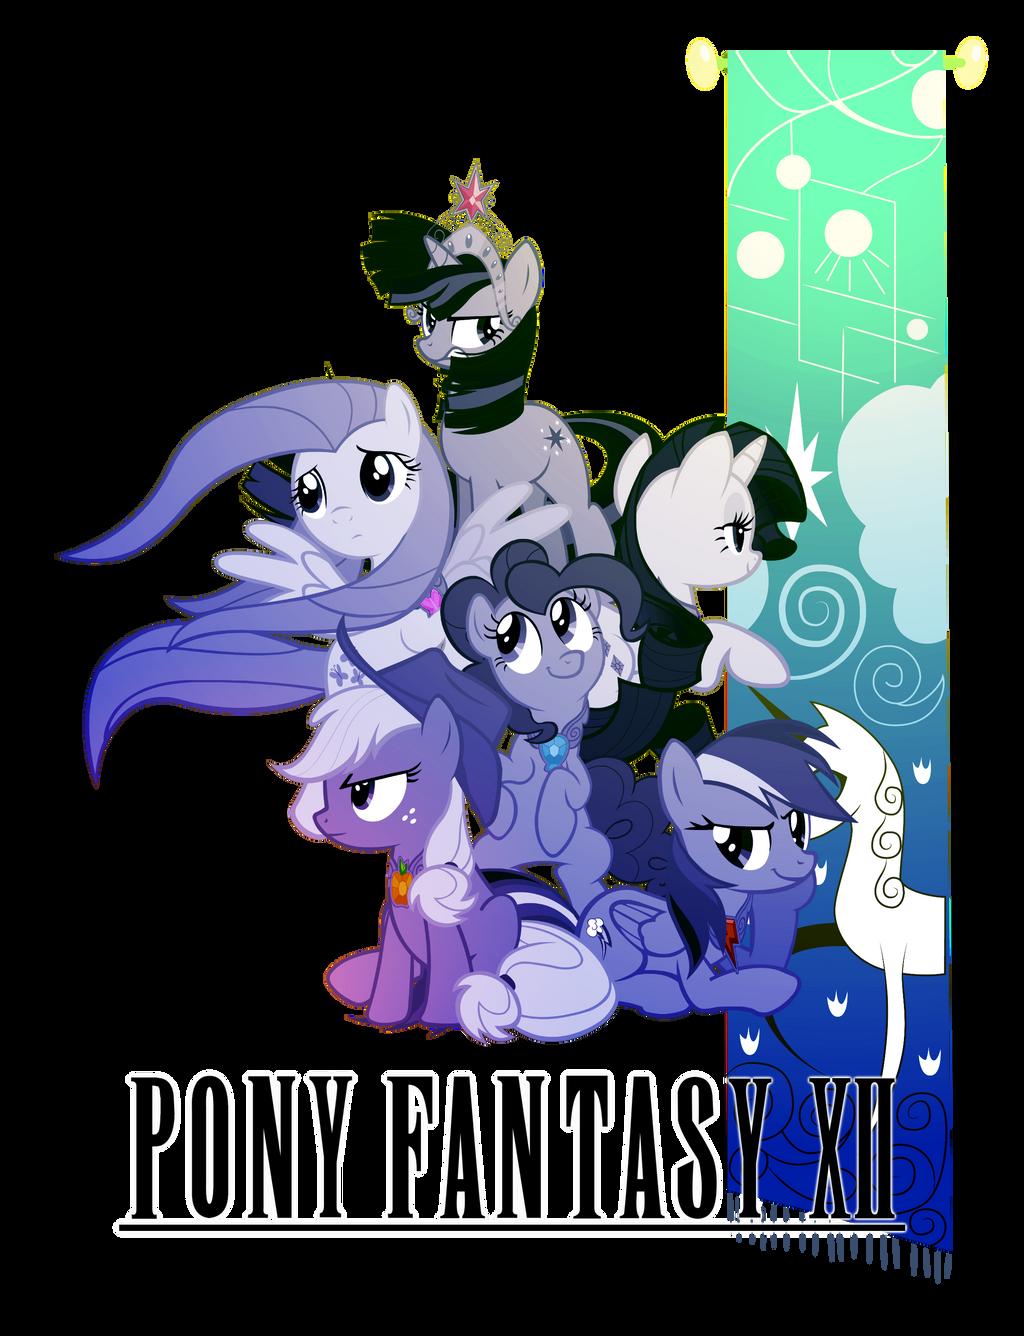 Pony Fantasy XII Logo by TheAuthorGl1m0